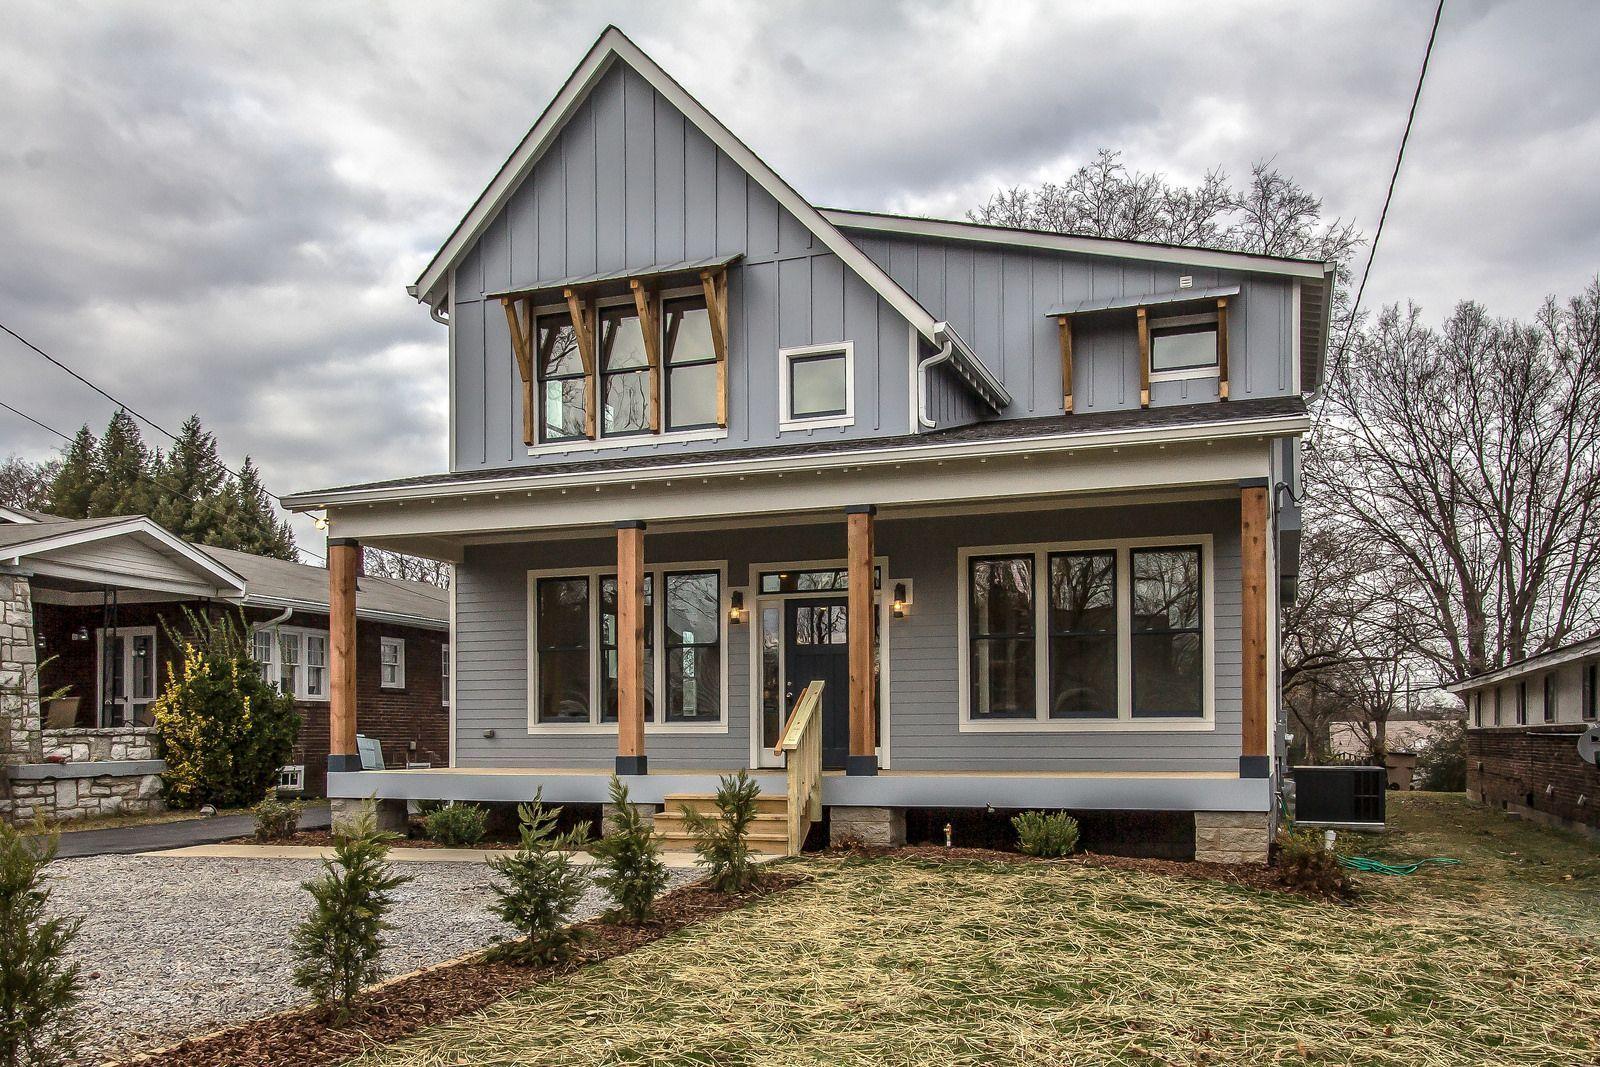 46 Top Modern Farmhouse Exterior Design Ideas u2013 FarmhouseMagz